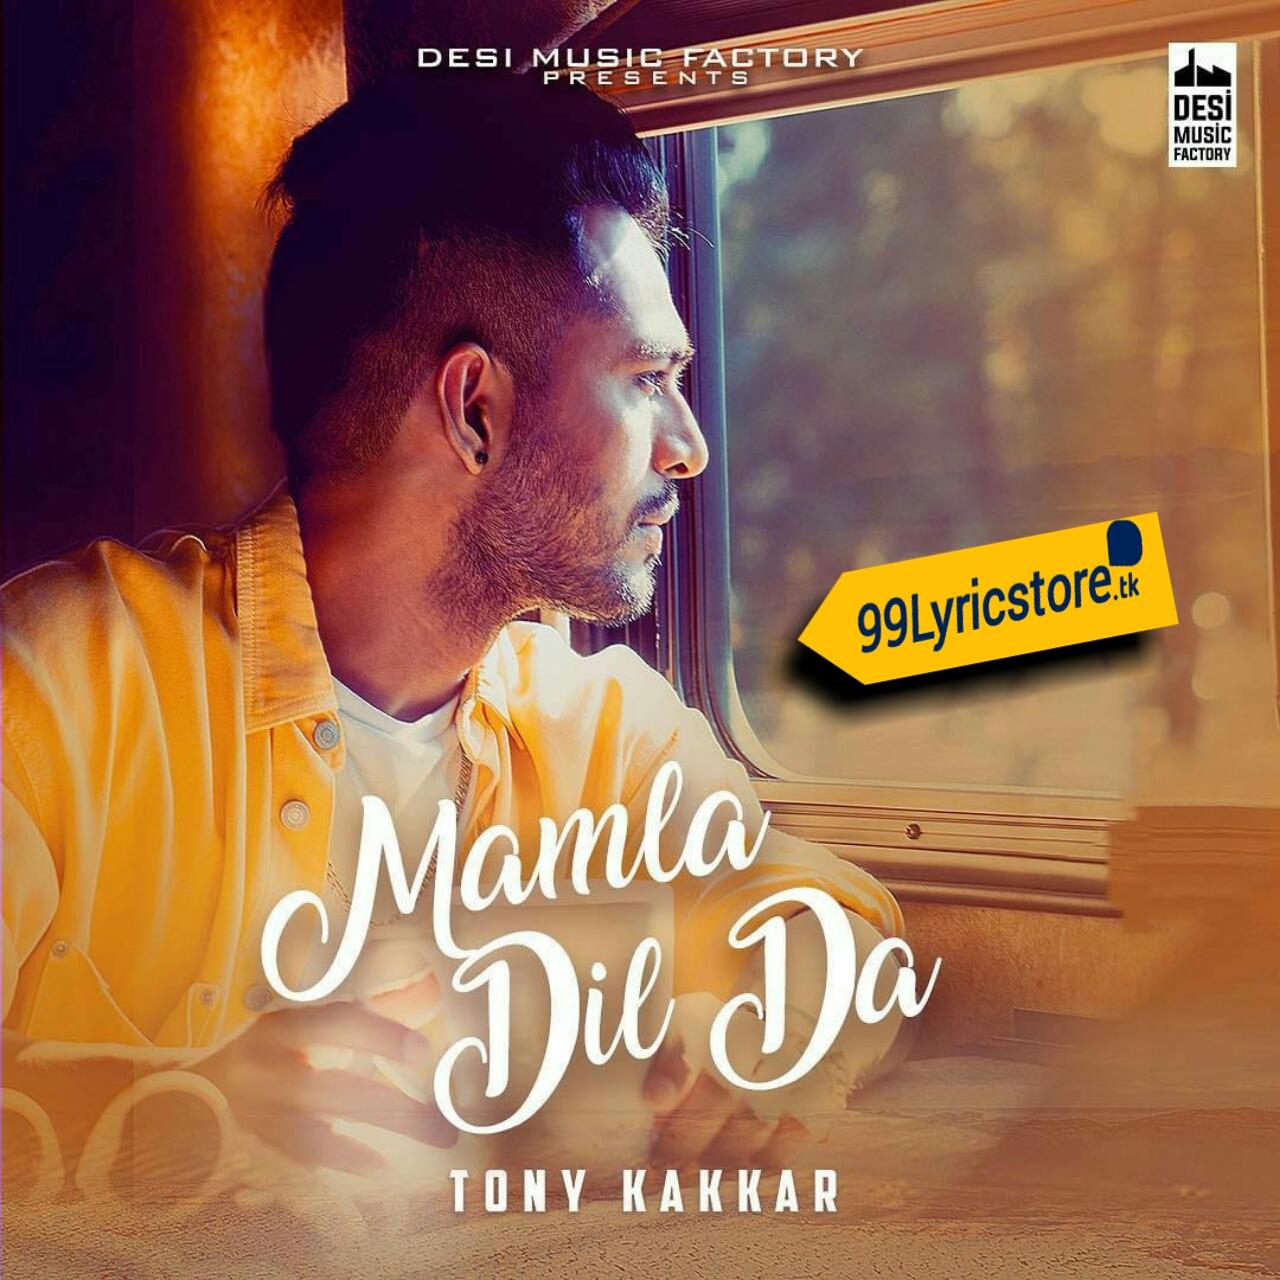 New Punjabi Song Lyrics 2018, Tony Kakkar Song Lyrics